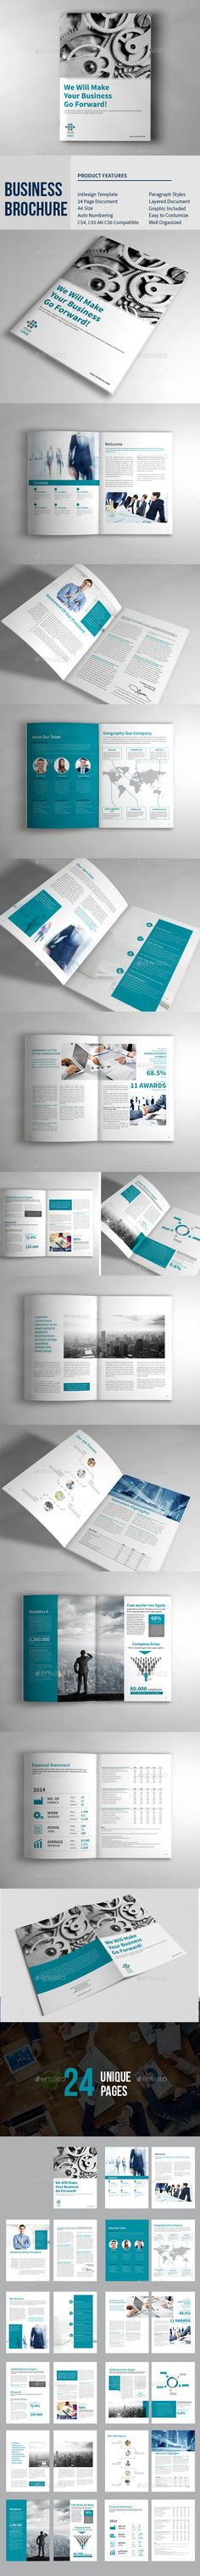 Multipurpose Business Brochure Template InDesign INDD #design Download: http://graphicriver.net/item/multipurpose-business-brochure/13760884?ref=ksioks